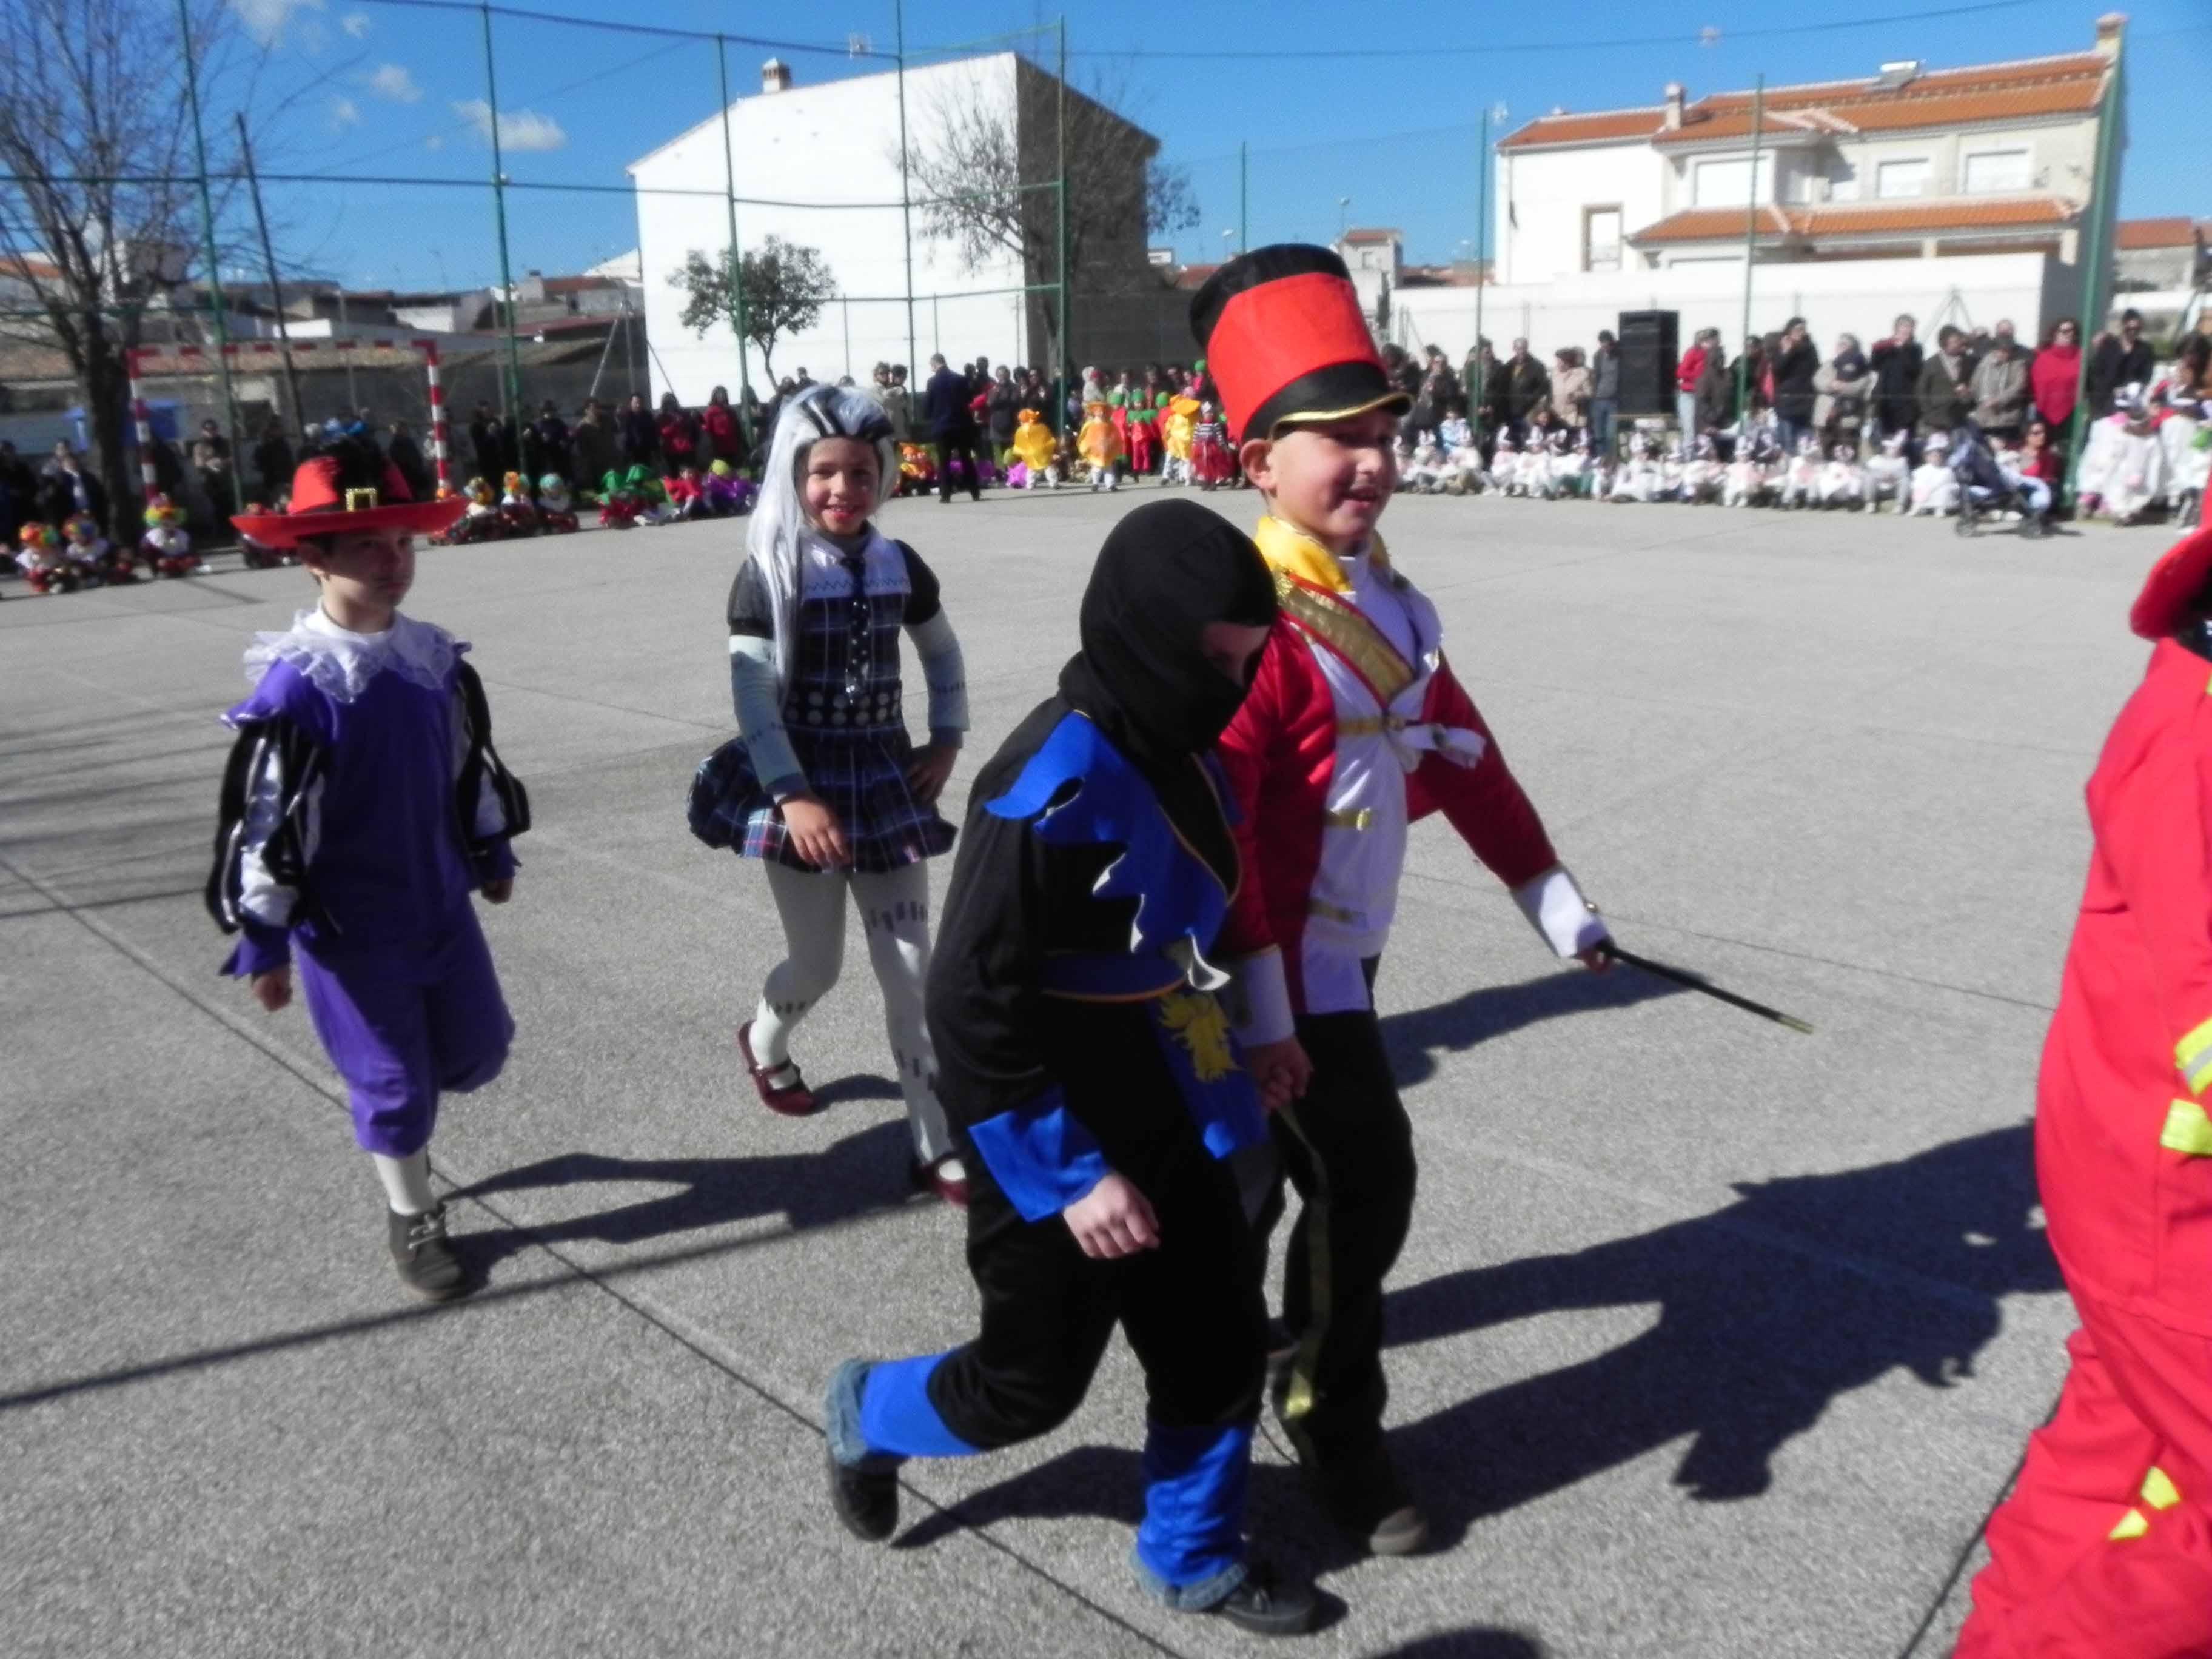 carnaval2013 1